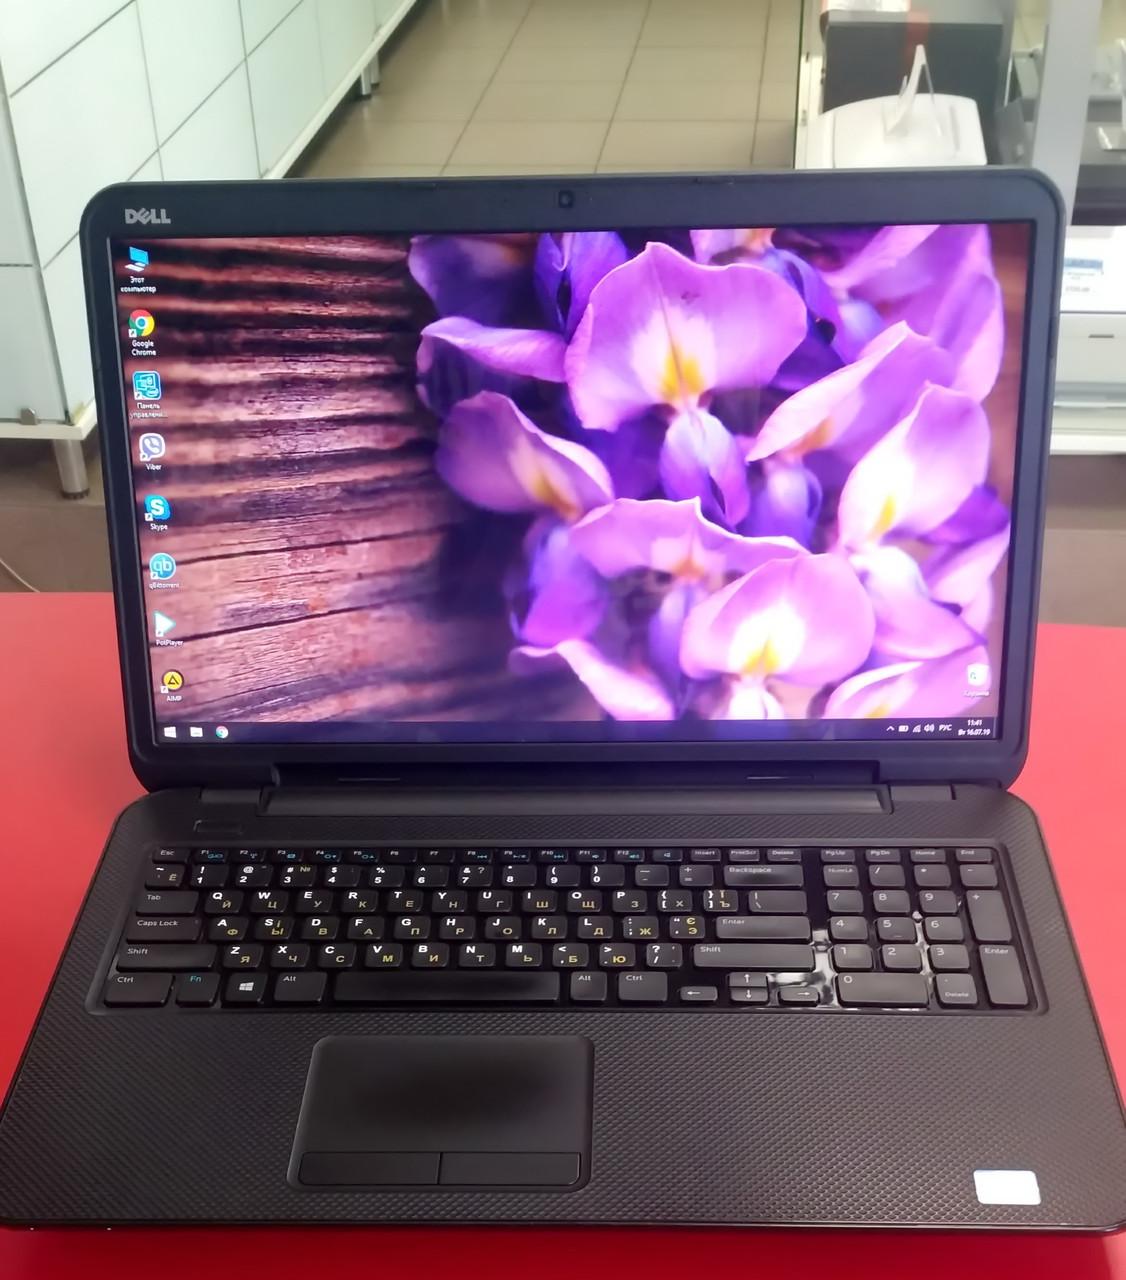 "Ноутбук Dell Inspiron 3721 17.3"" Intel Core i3 1.9 GHz 4 GB RAM 320 GB HDD Black Б/У"